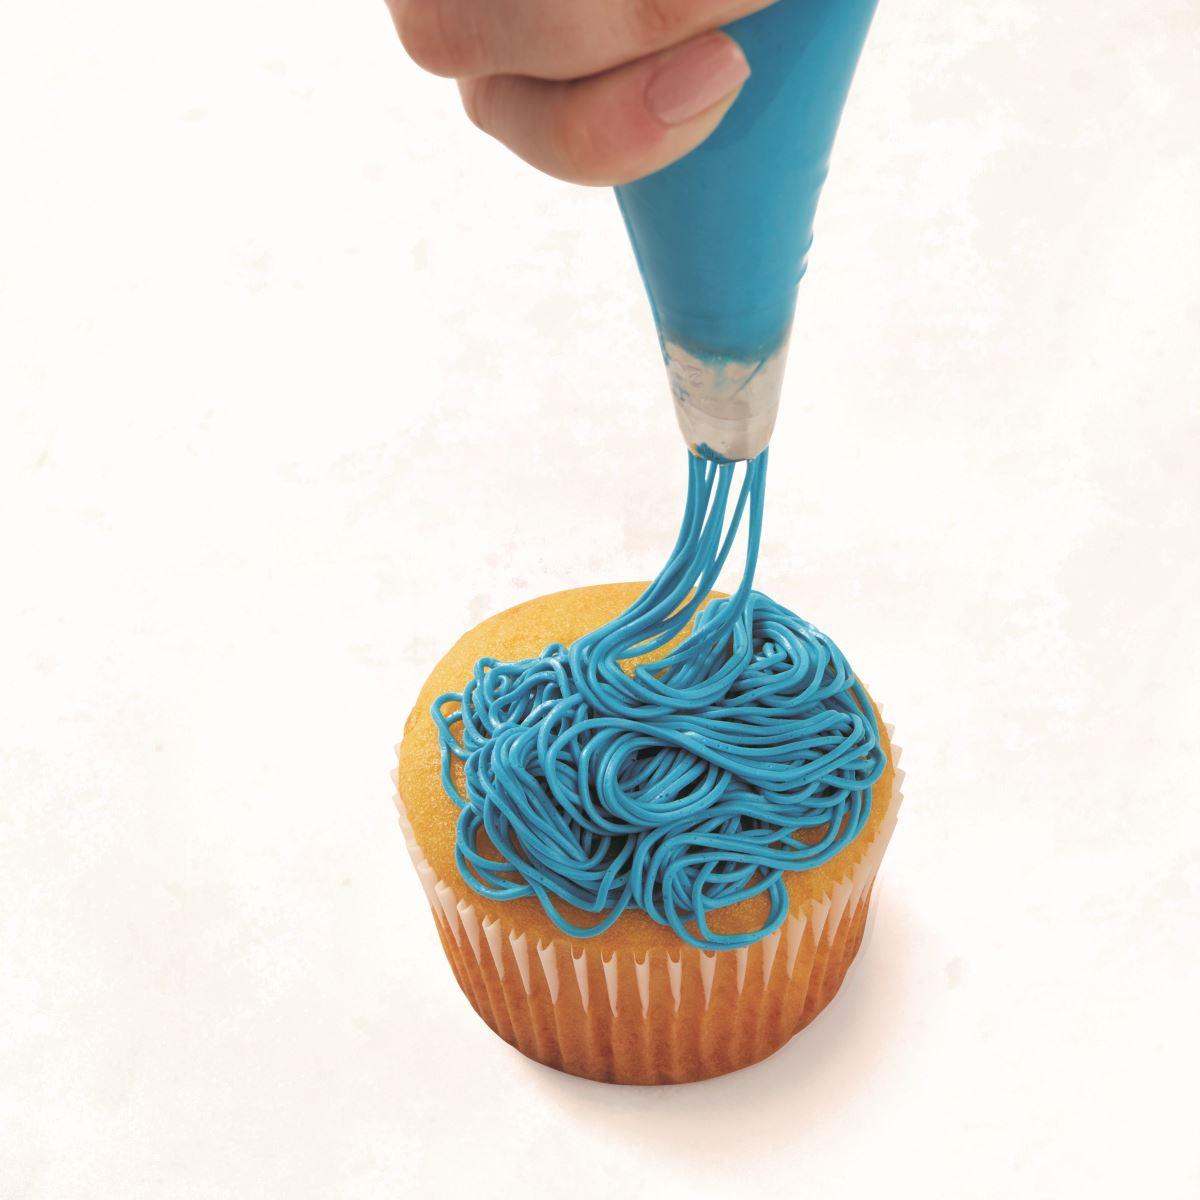 BLUE MULTI-EYED CUPCAKE step 1